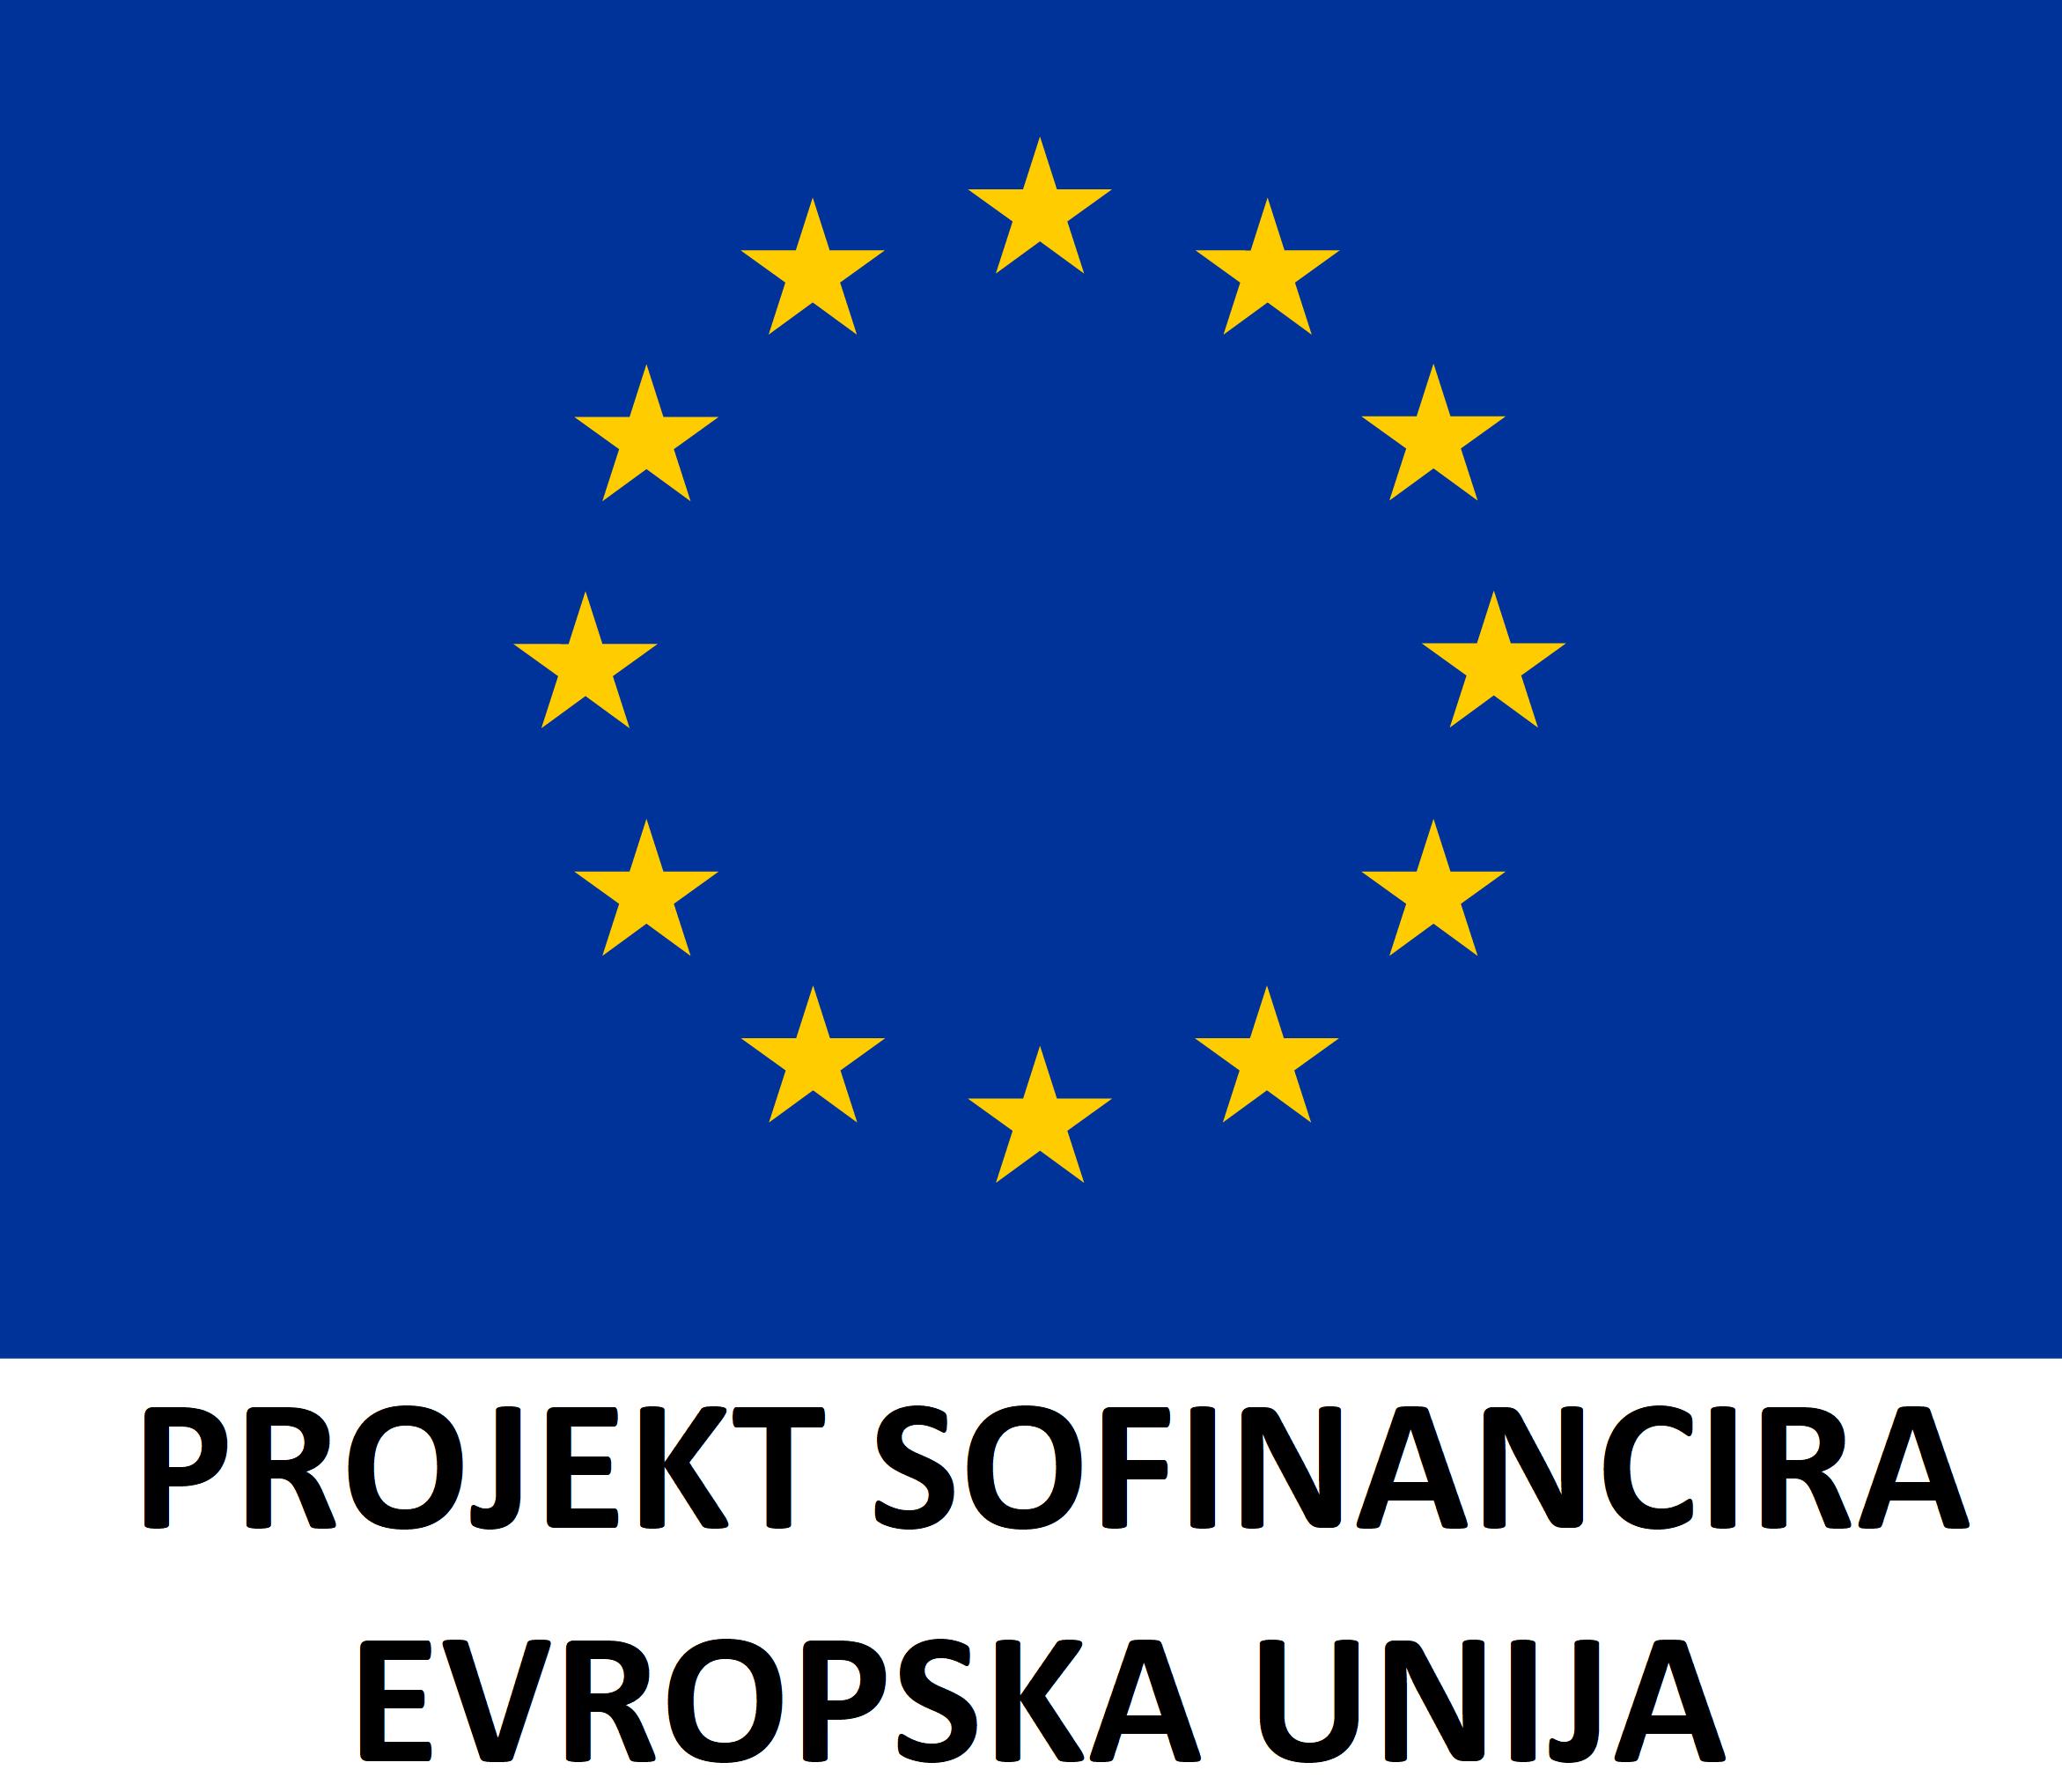 Projekt sofinancira EU_črne črke_velika